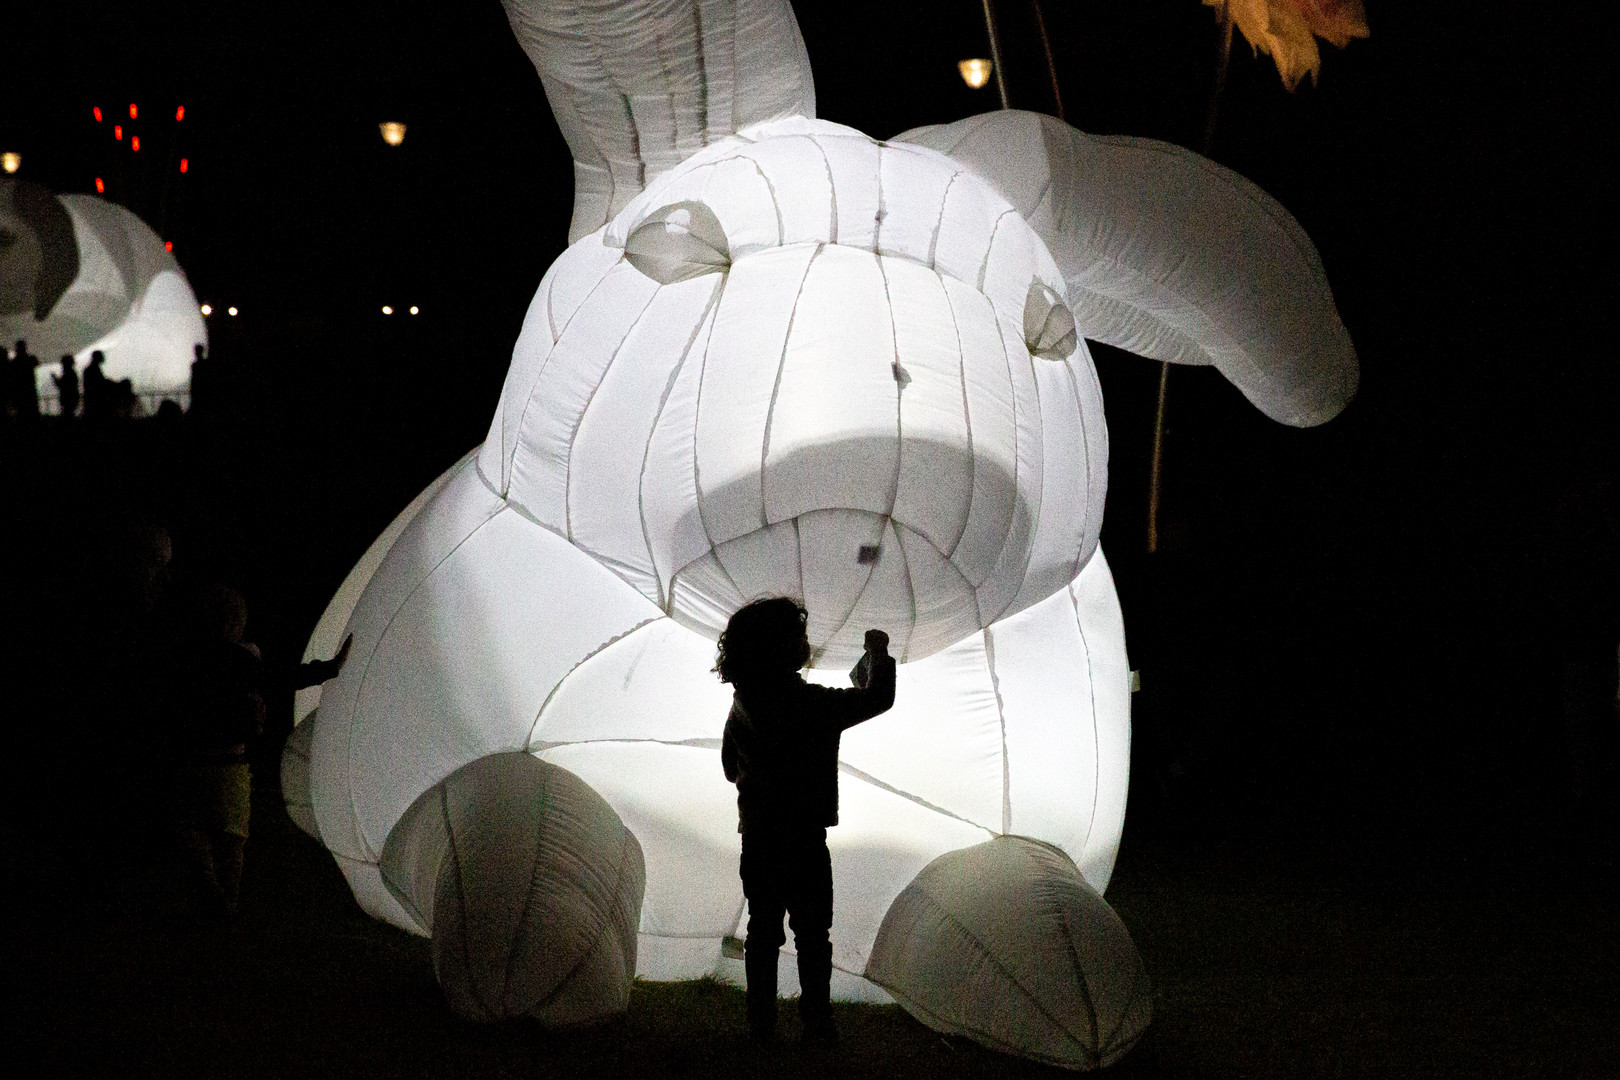 Following the White Rabbit